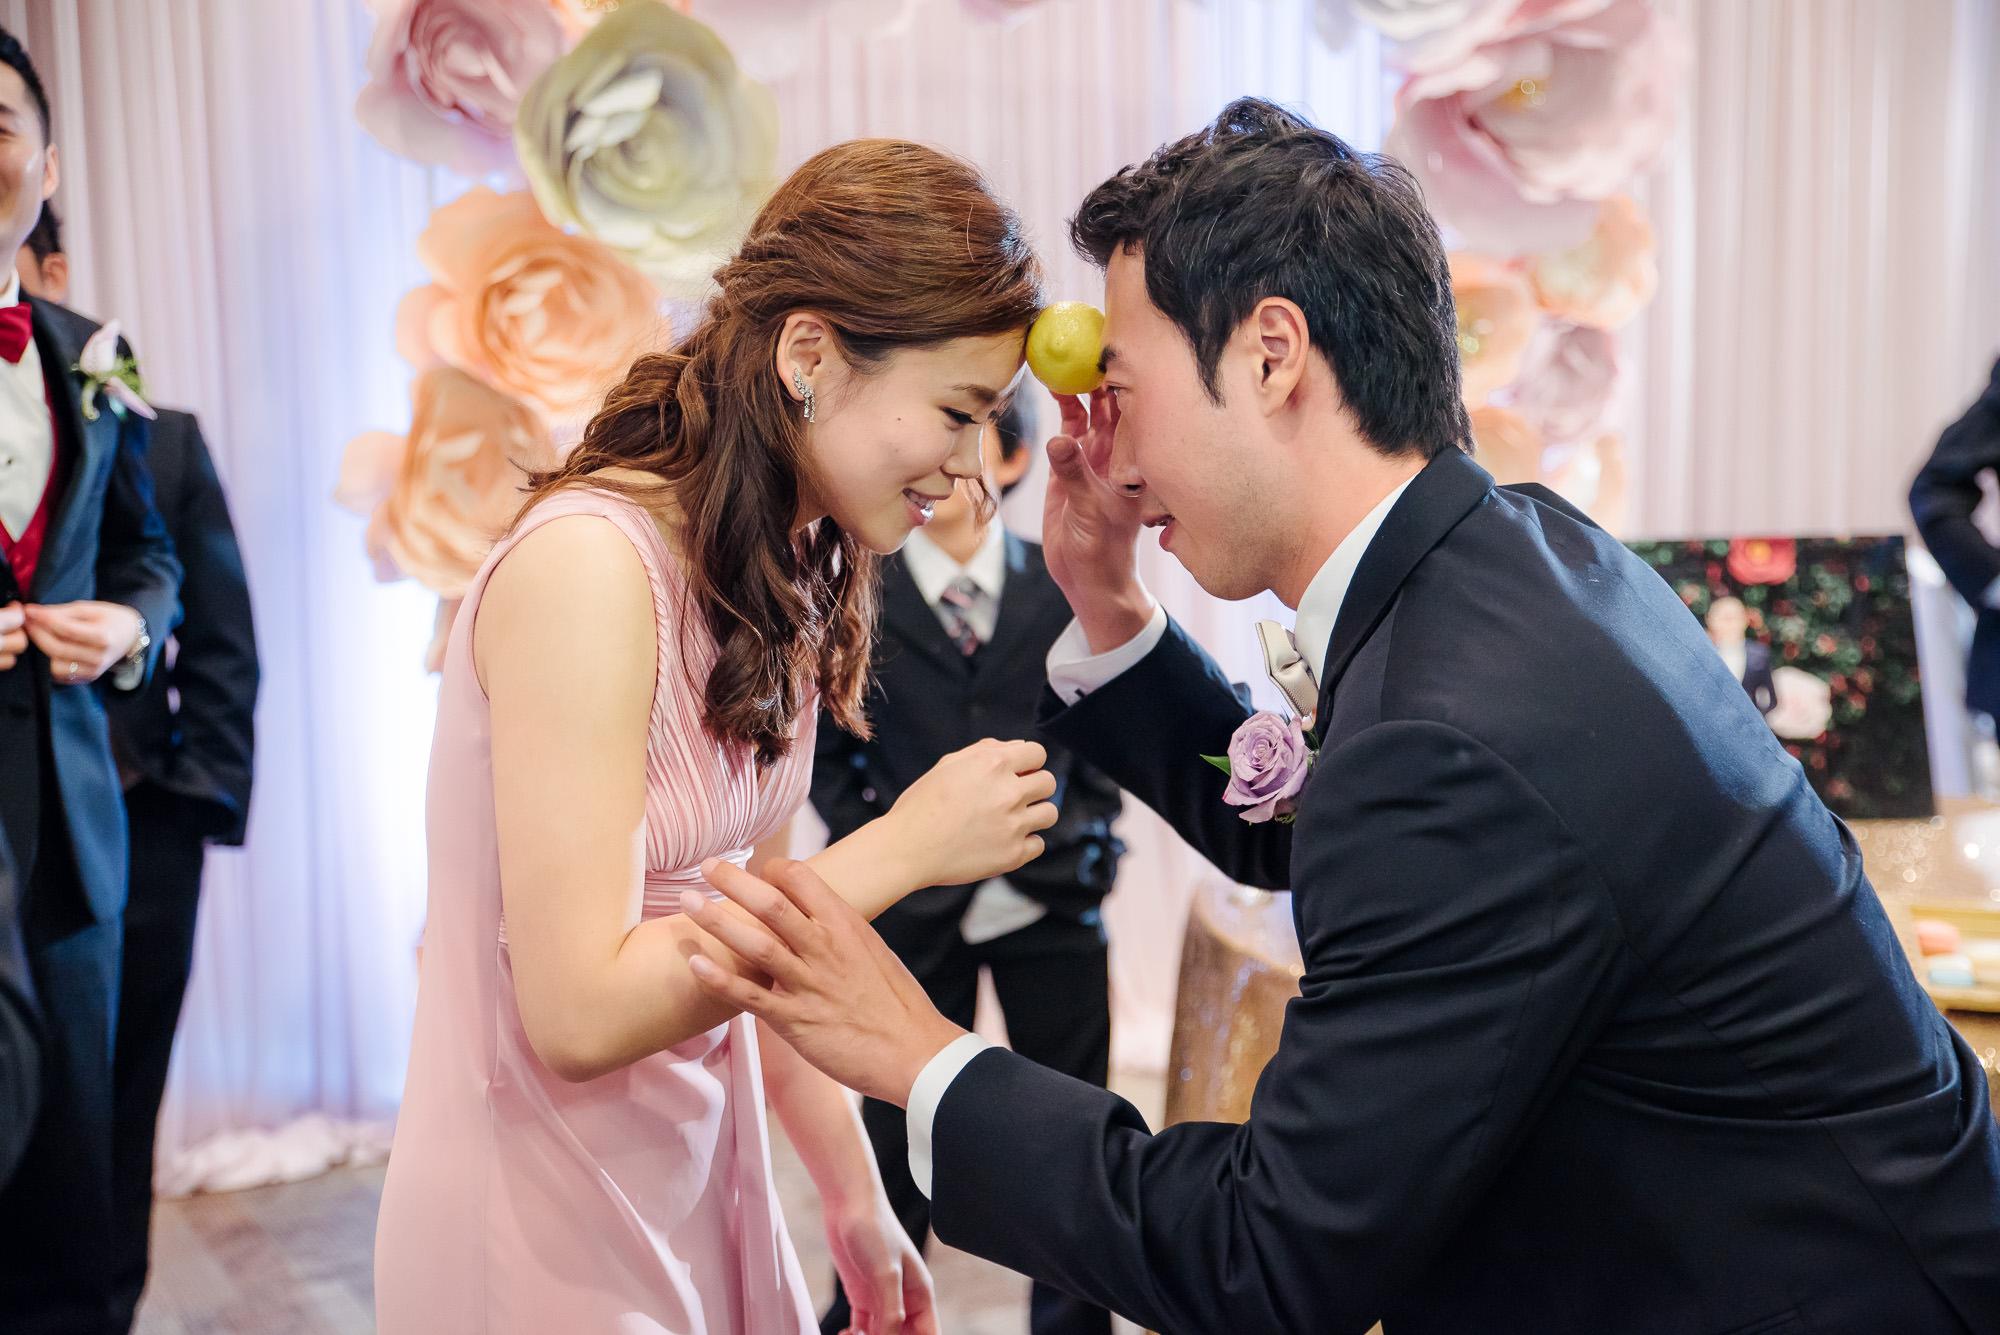 richmond_wedding_reception 21155516.jpg